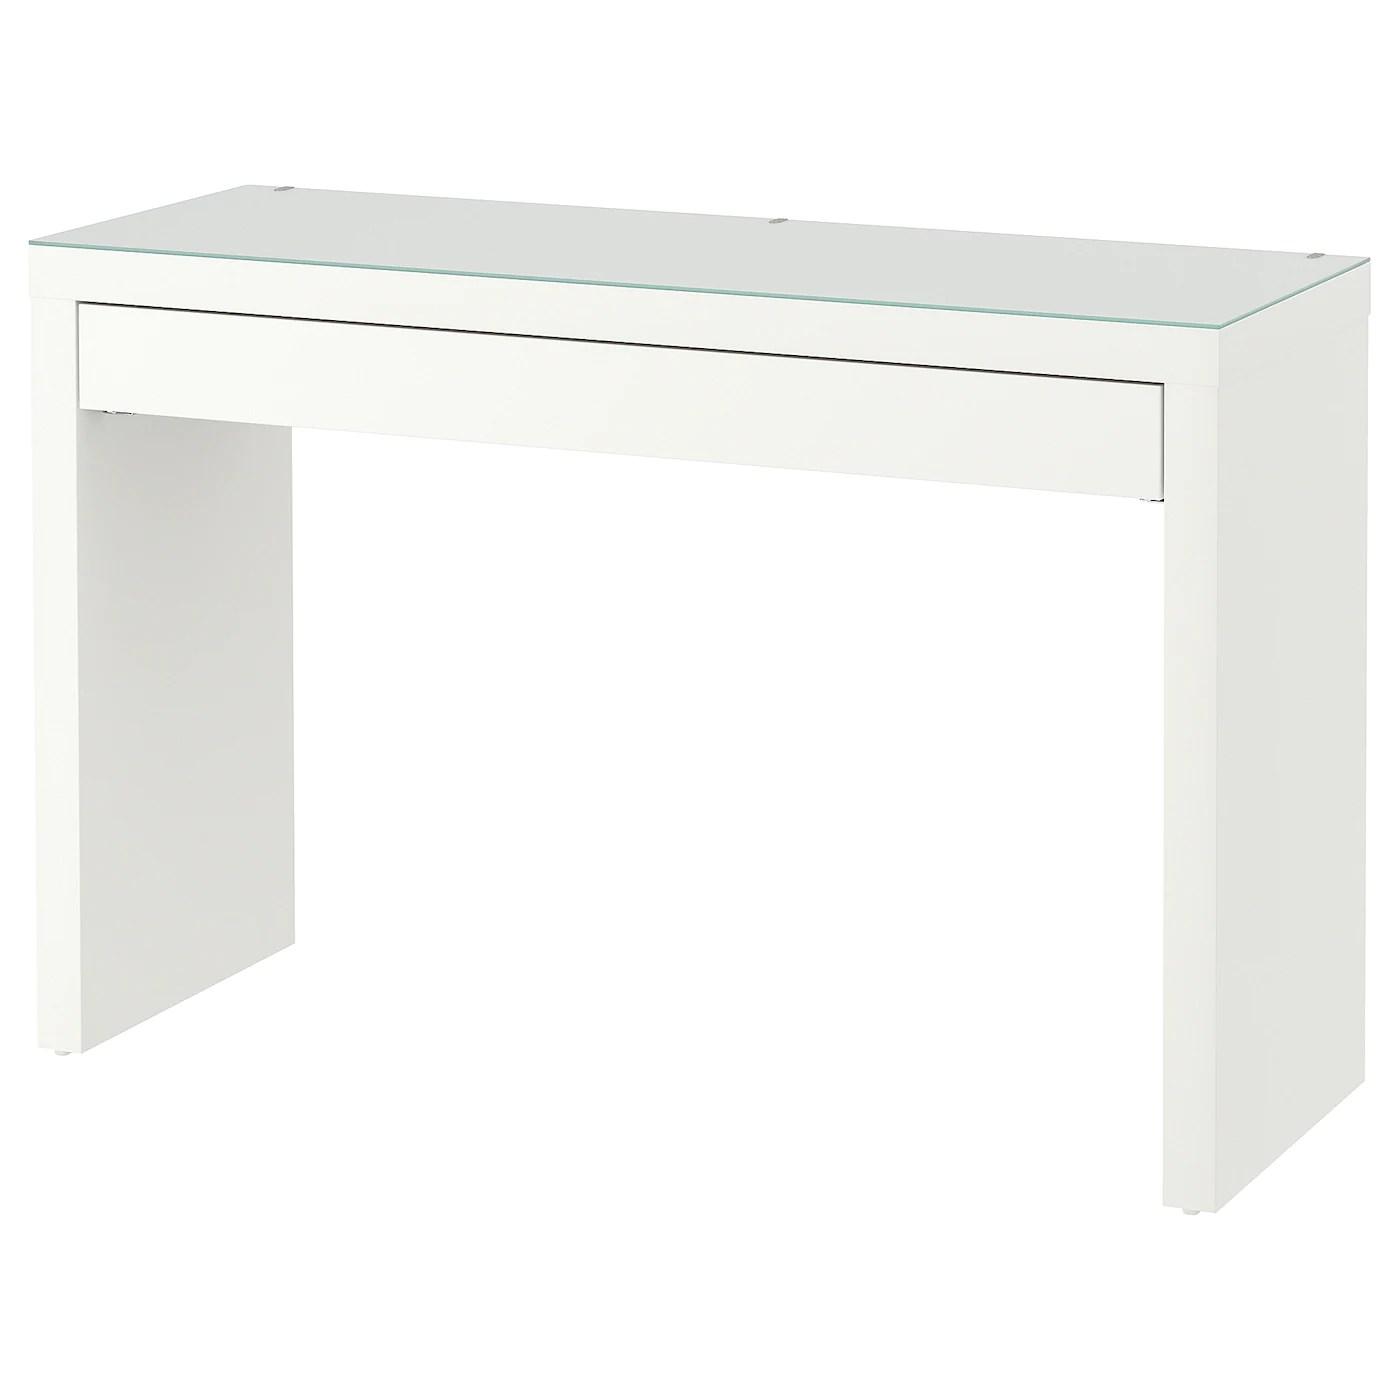 malm dressing table white 120x41 cm